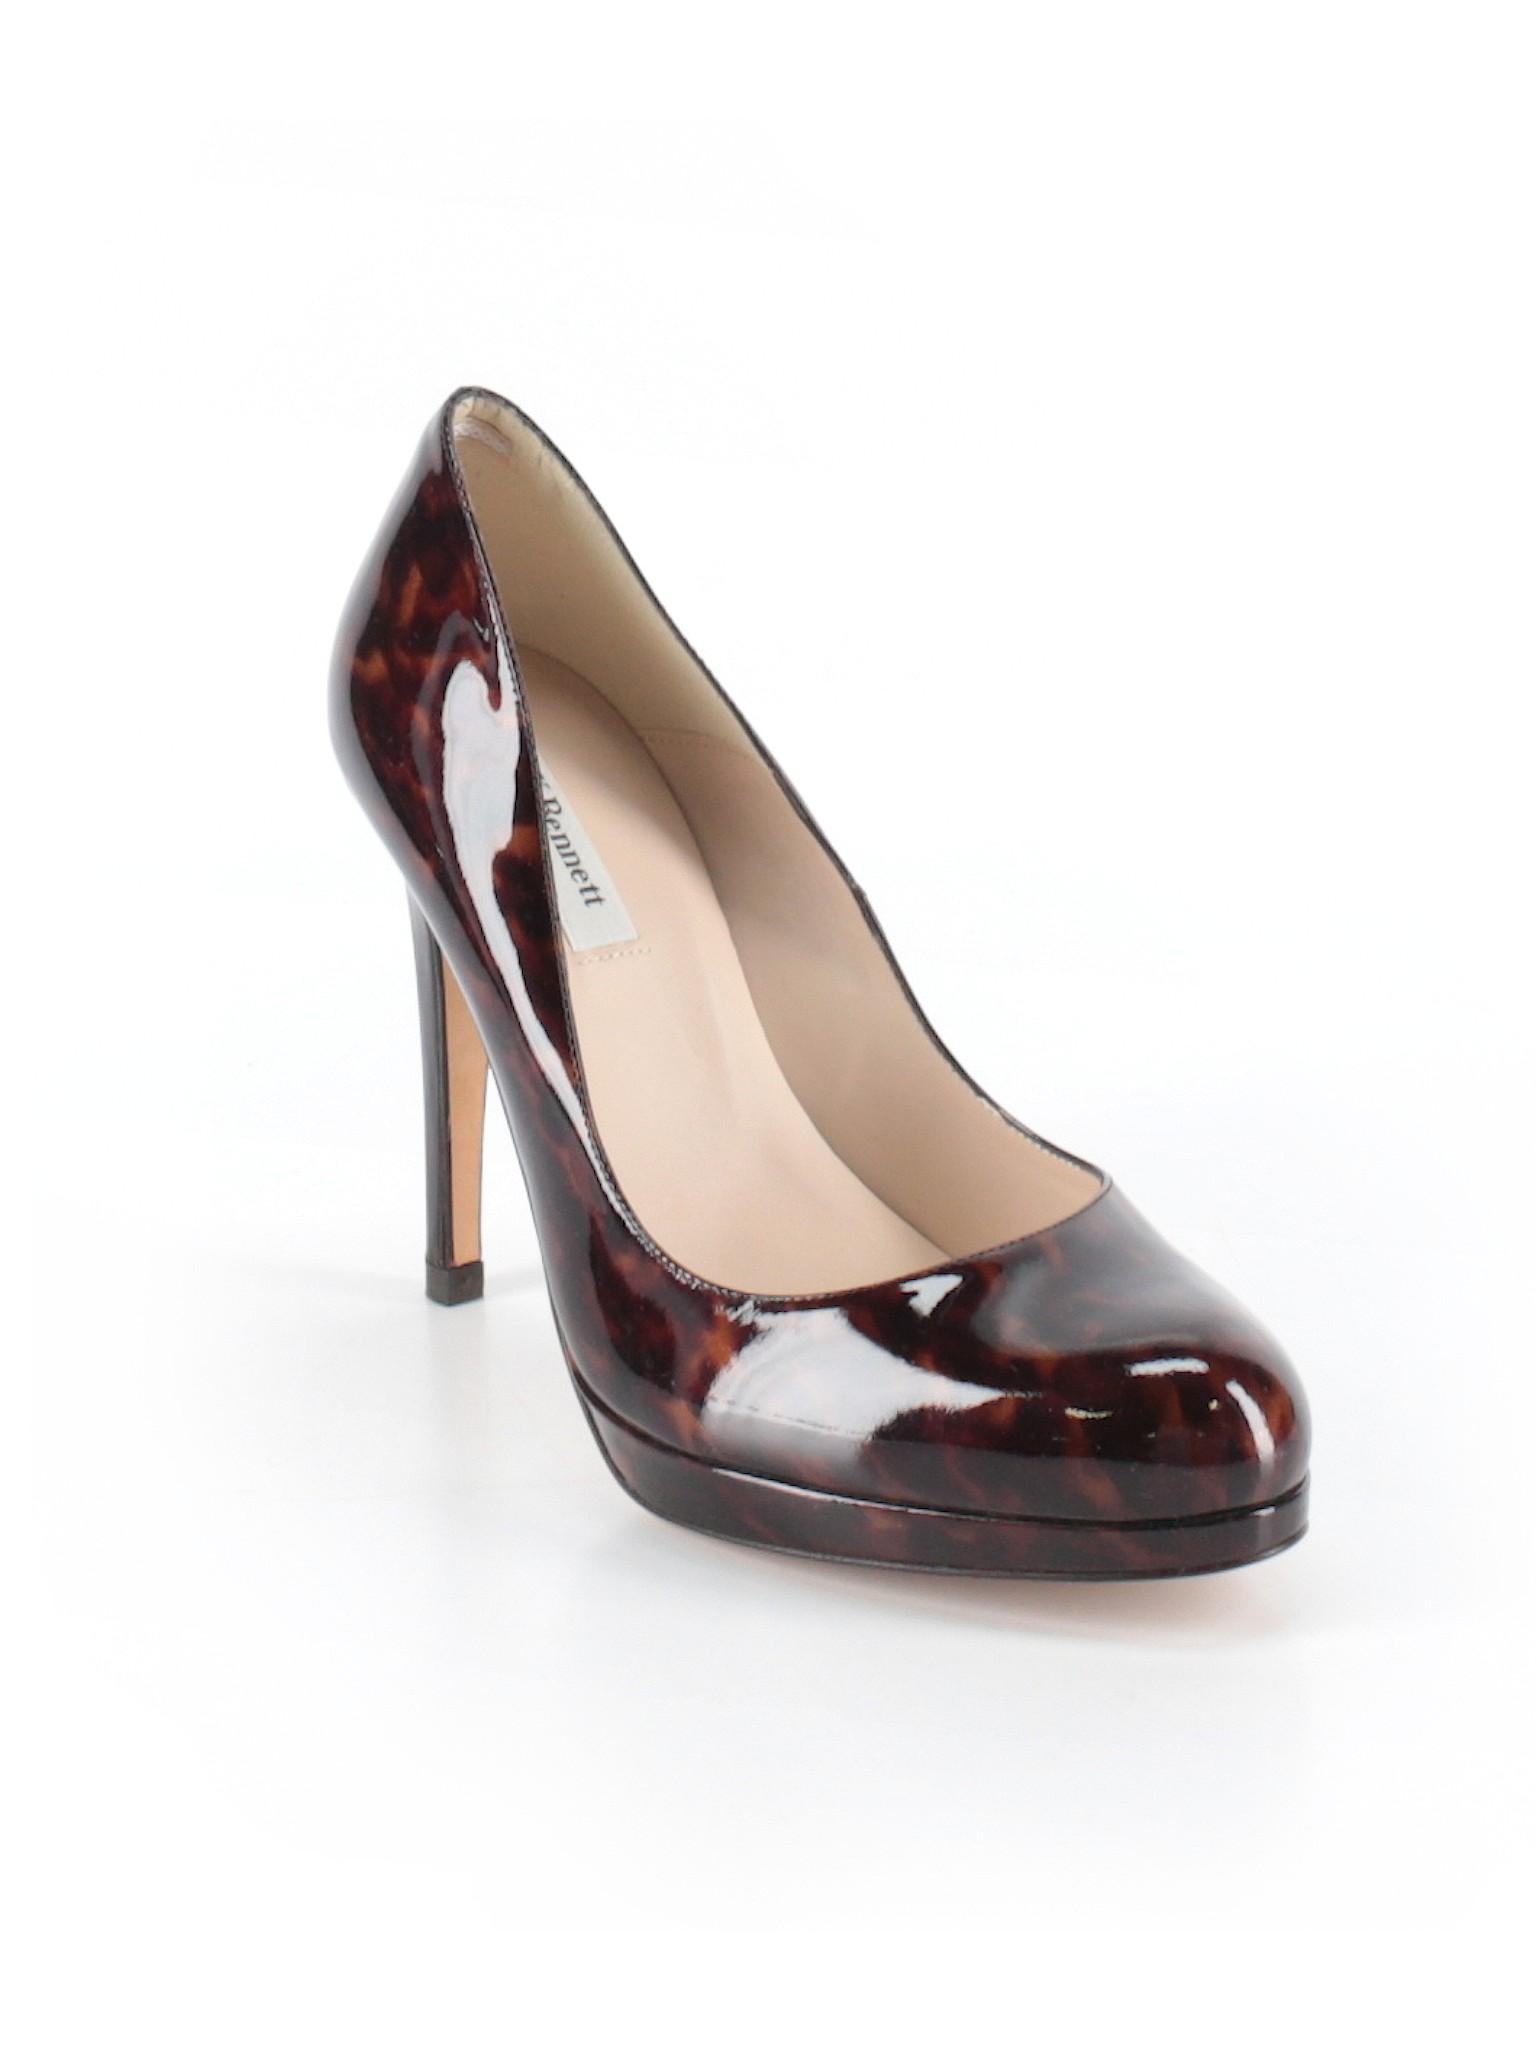 promotion Heels Boutique Bennett L K fz1Cq